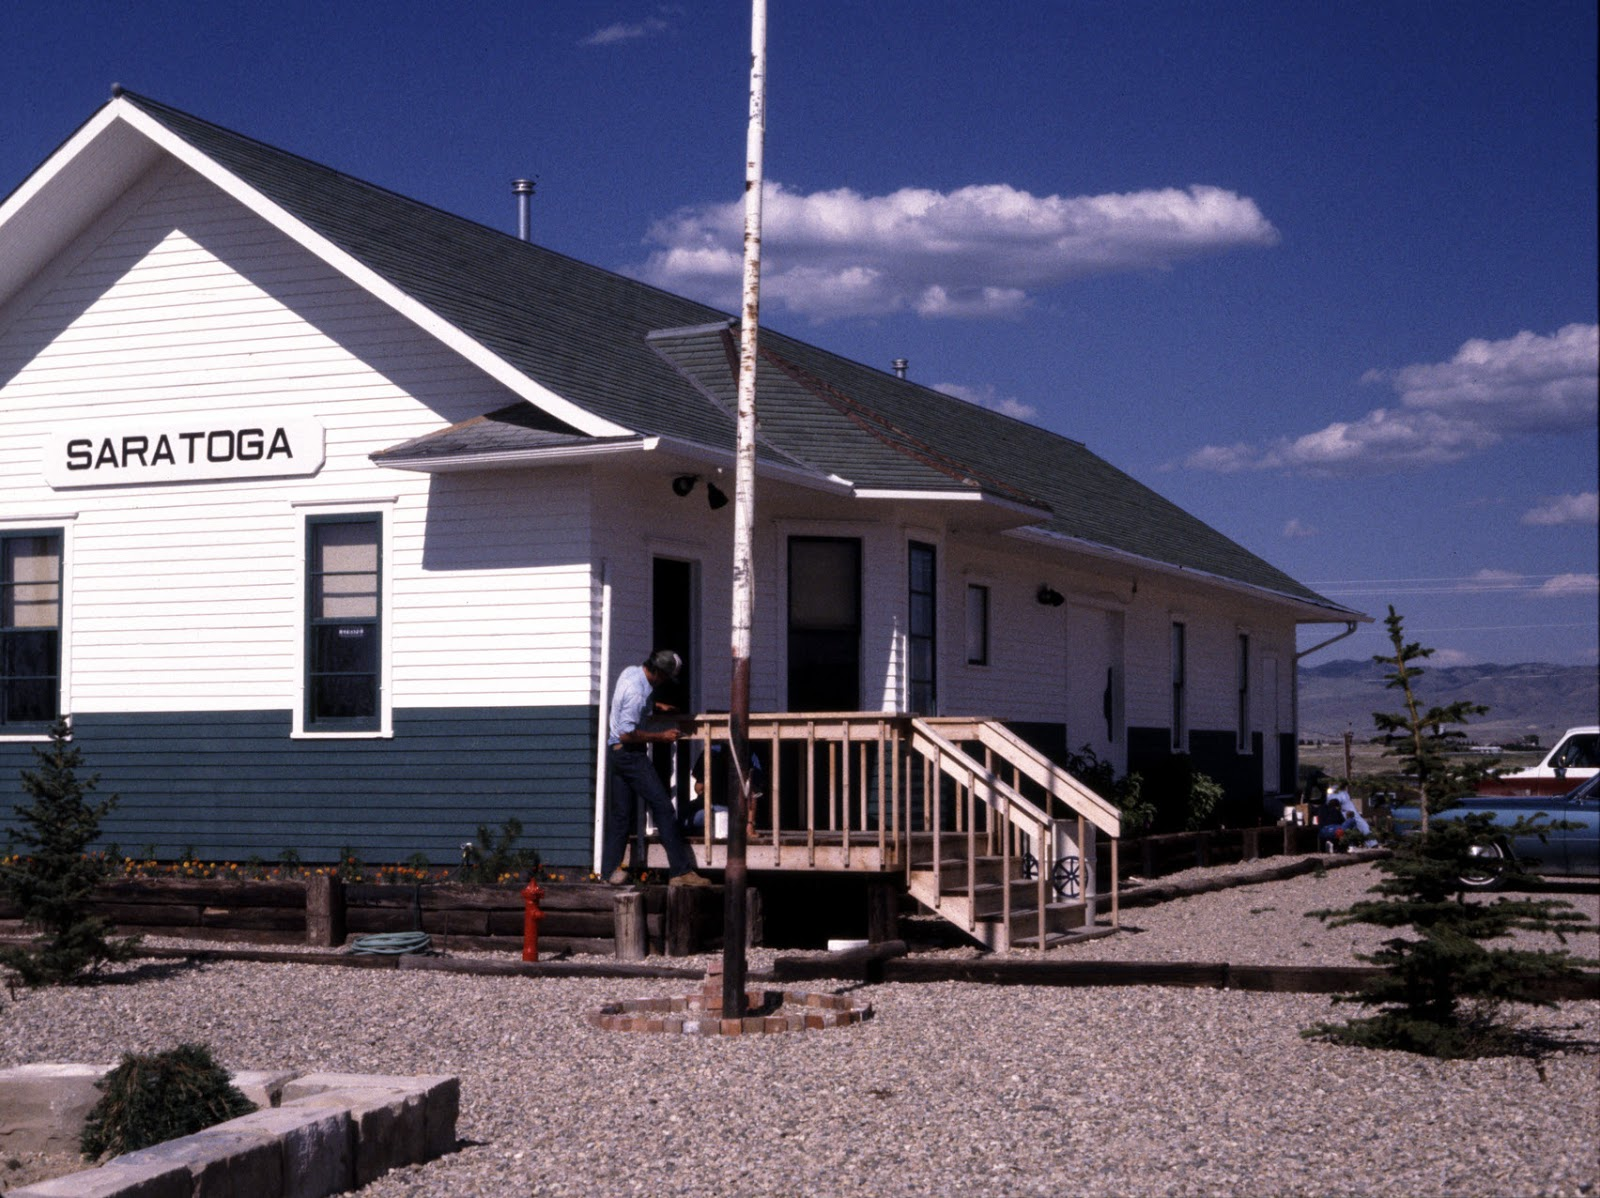 Saratoga & Encampment Railway depot